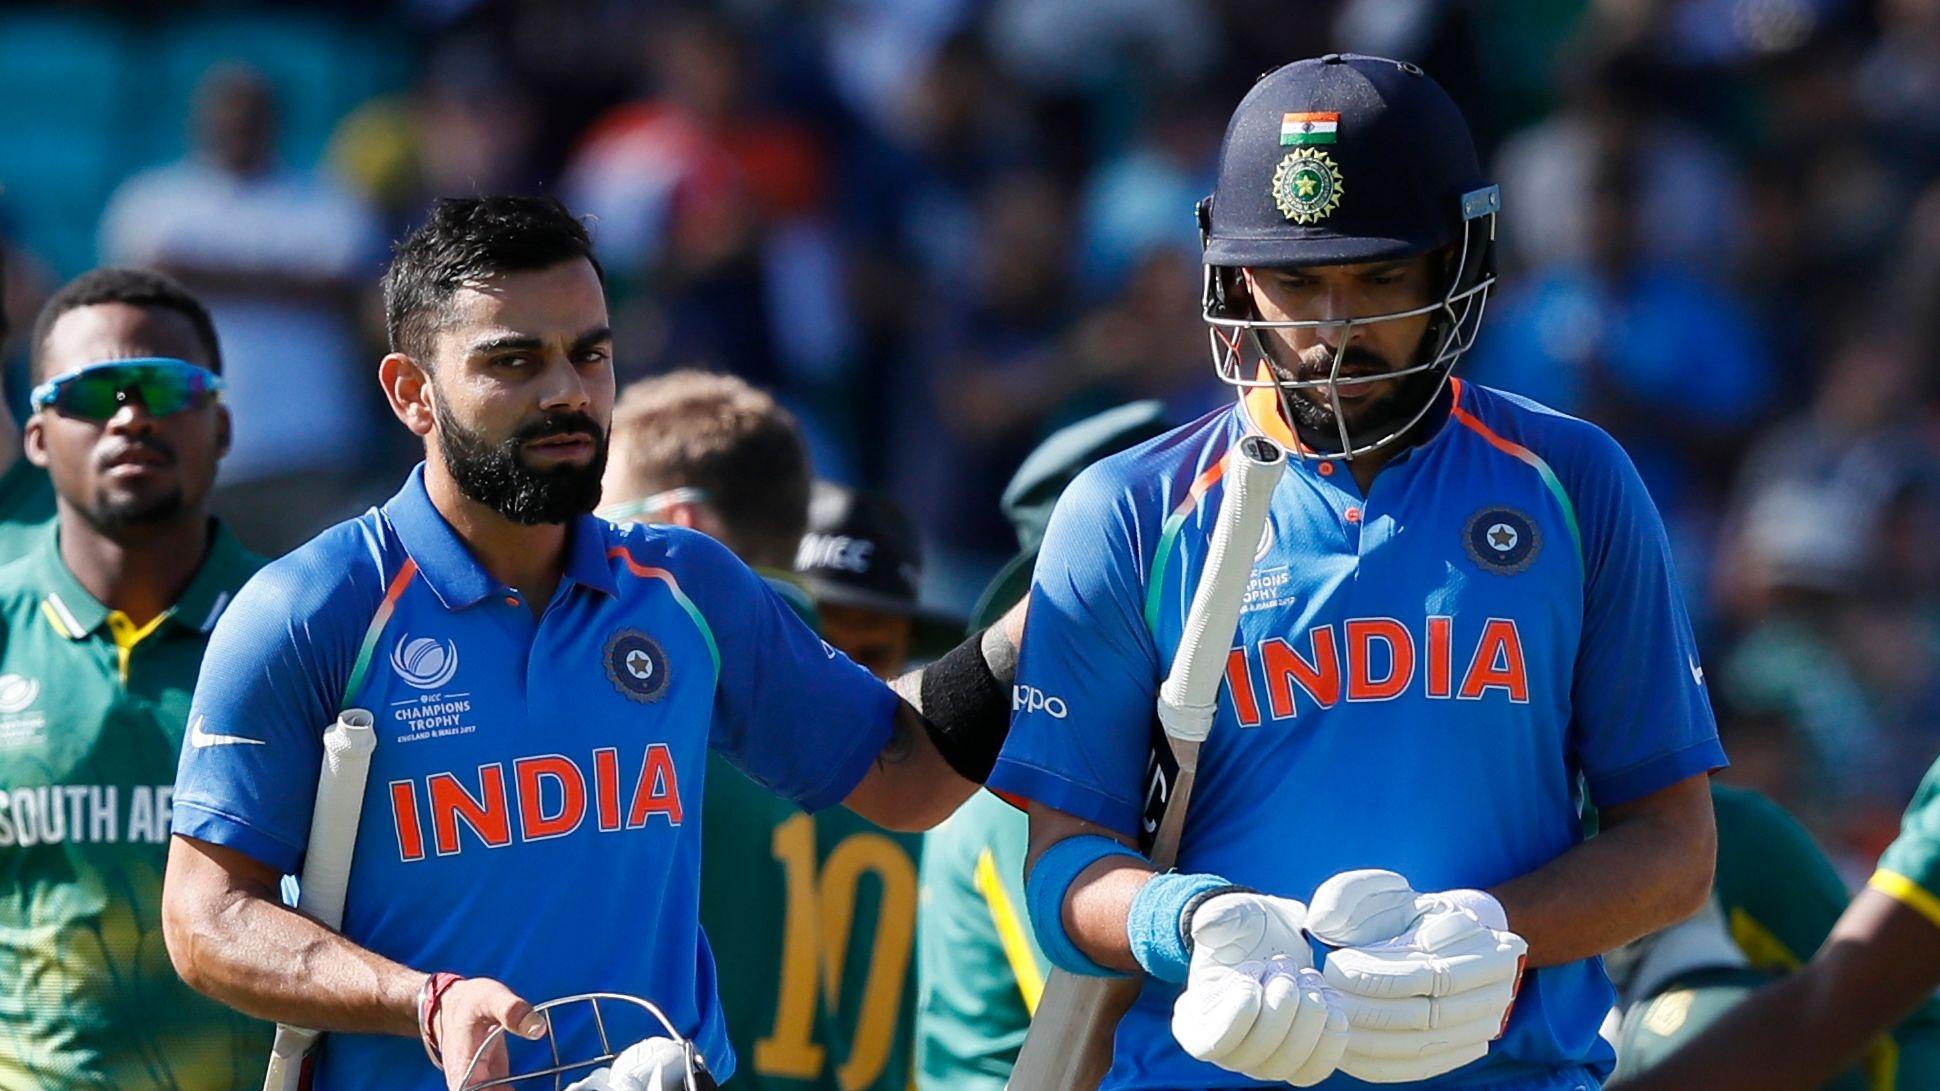 Yuvraj Singh Says Team Management 'Made Excuses' to Drop Him